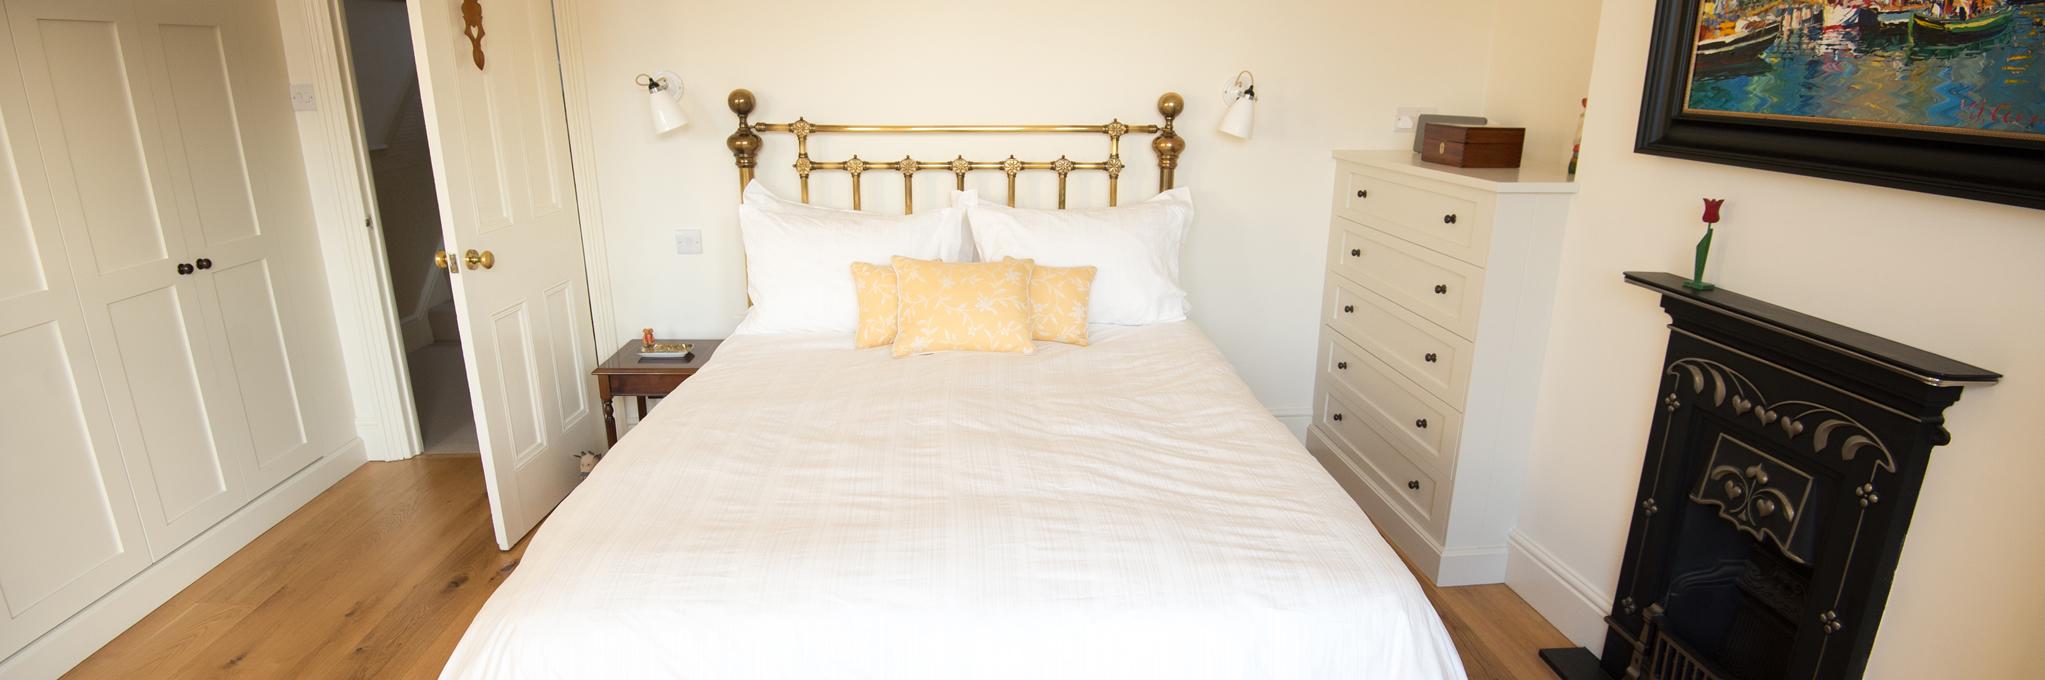 Sleep easy with your perfect bedroom